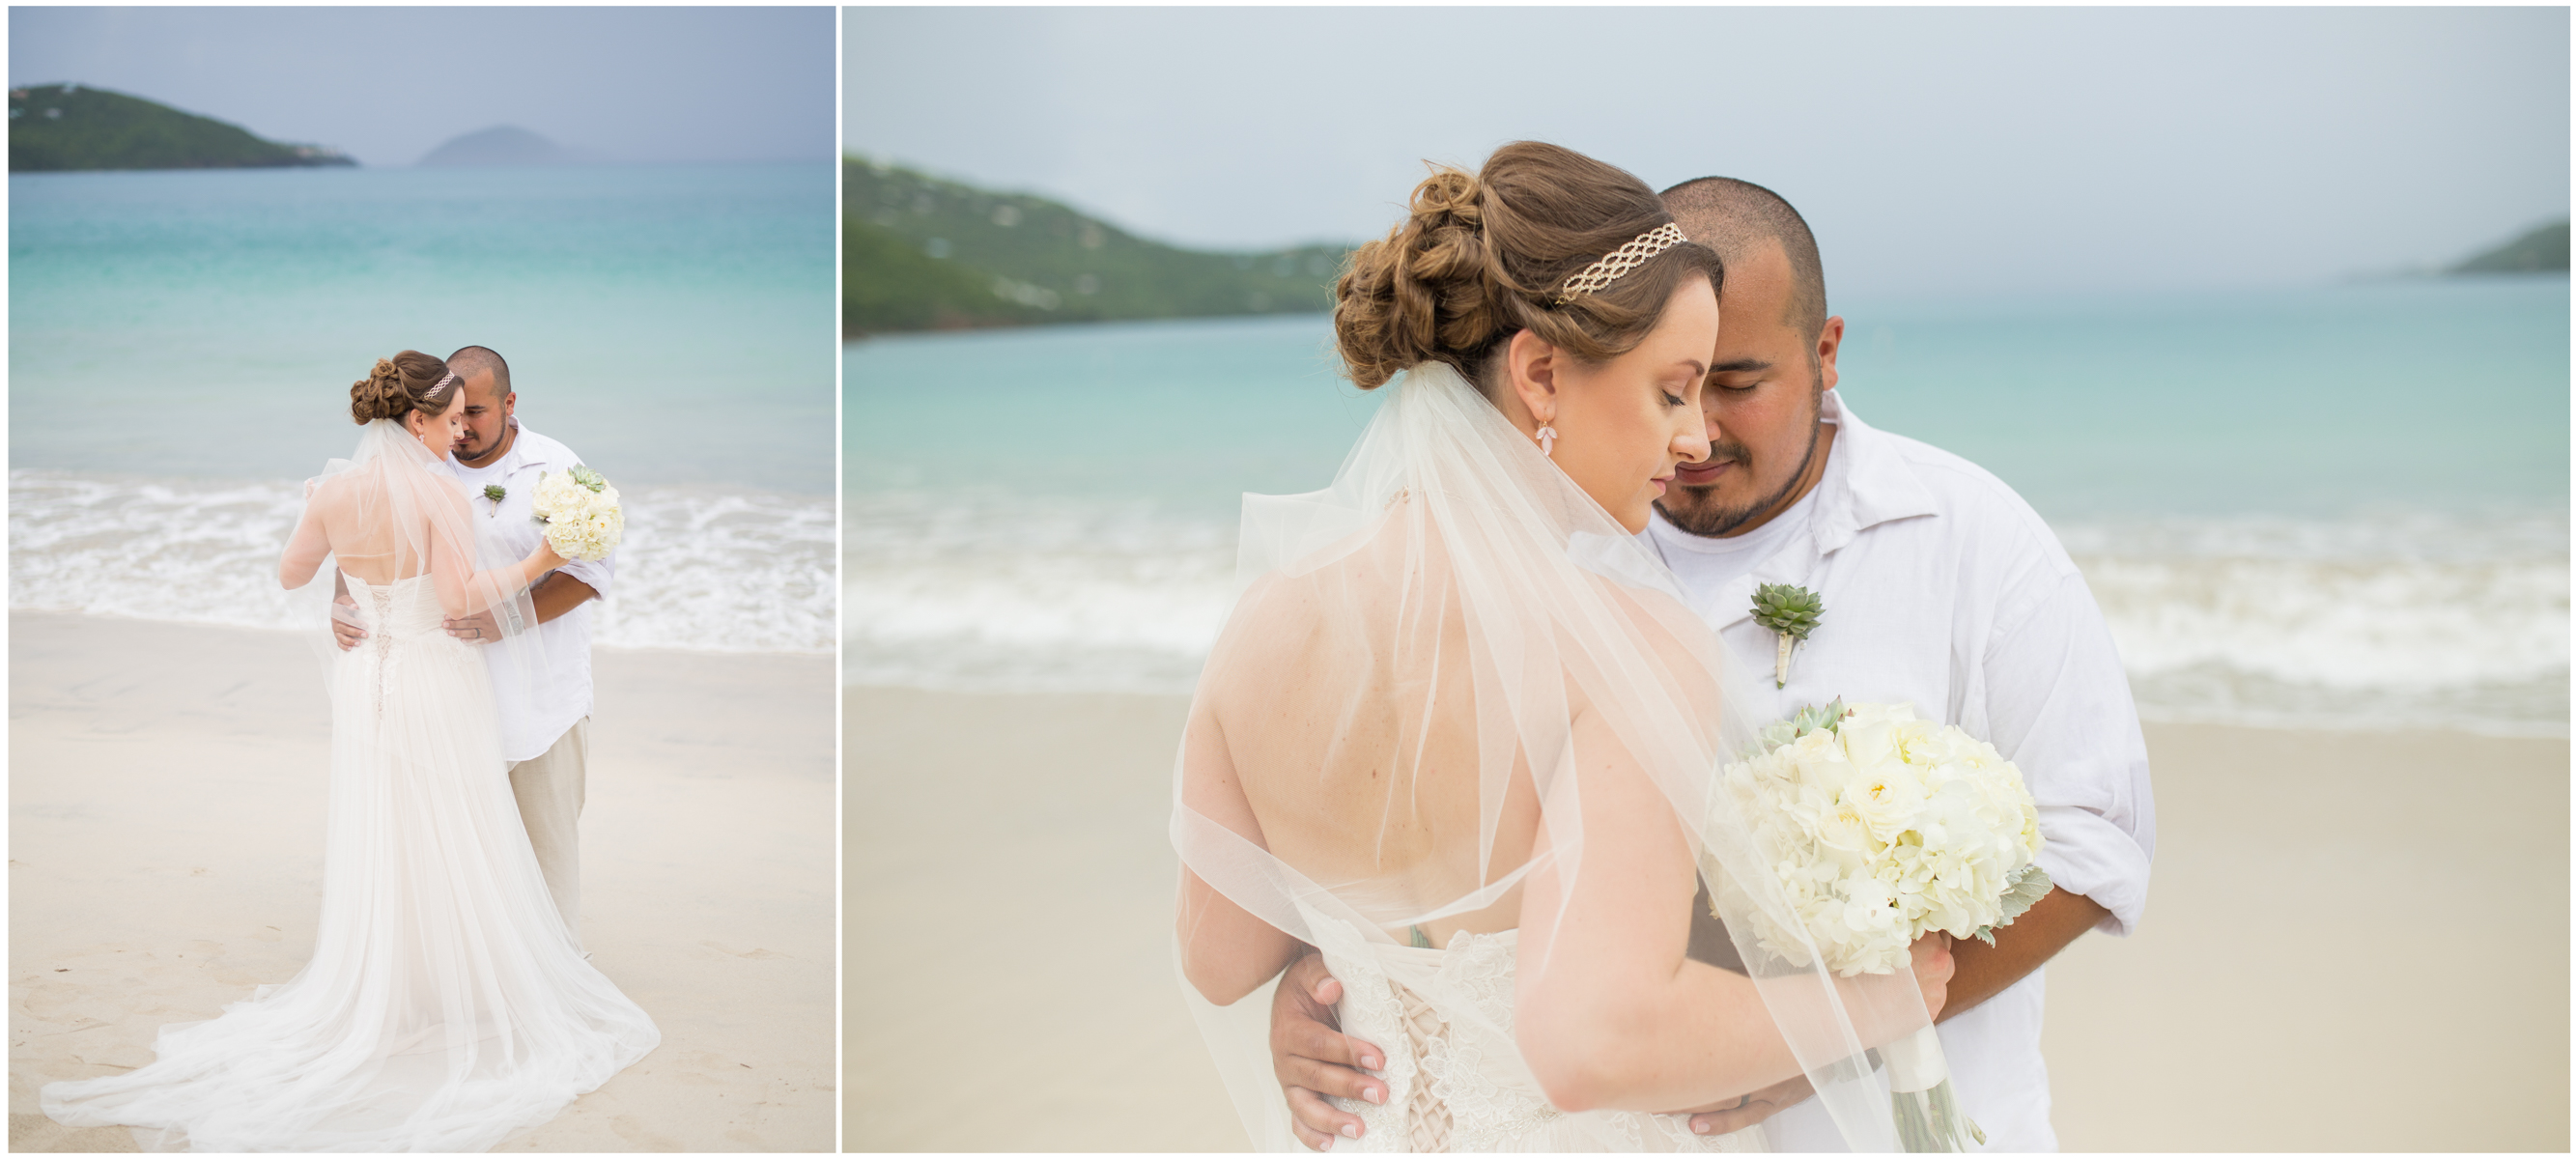 Magens Bay Wedding Photography St. Thomas